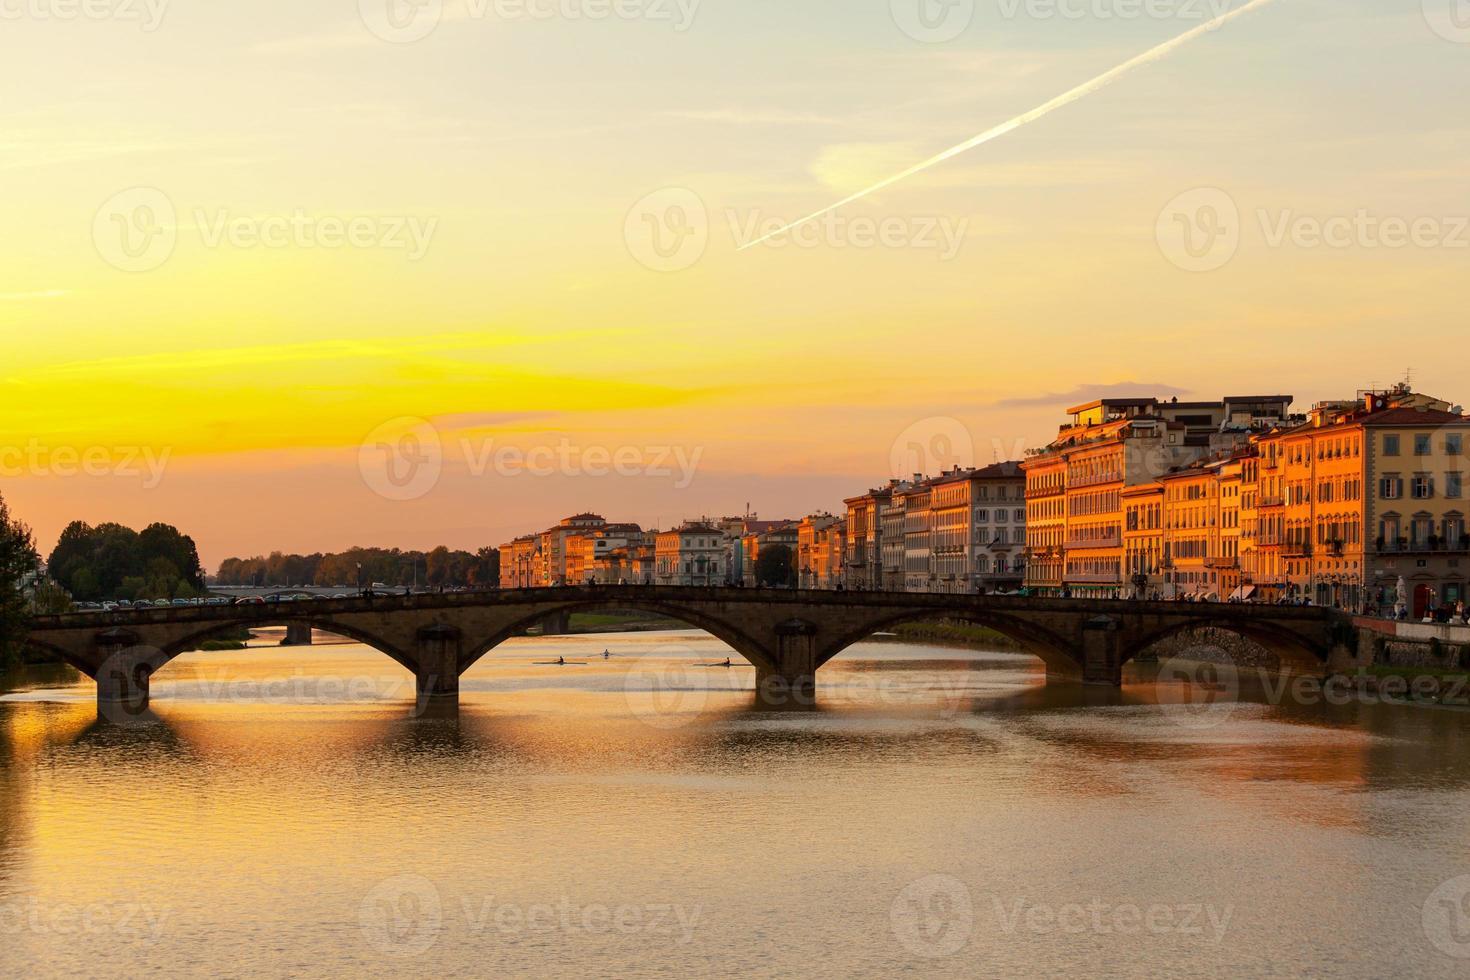 Florenz - Ponte alla Carraia bei Sonnenuntergang foto